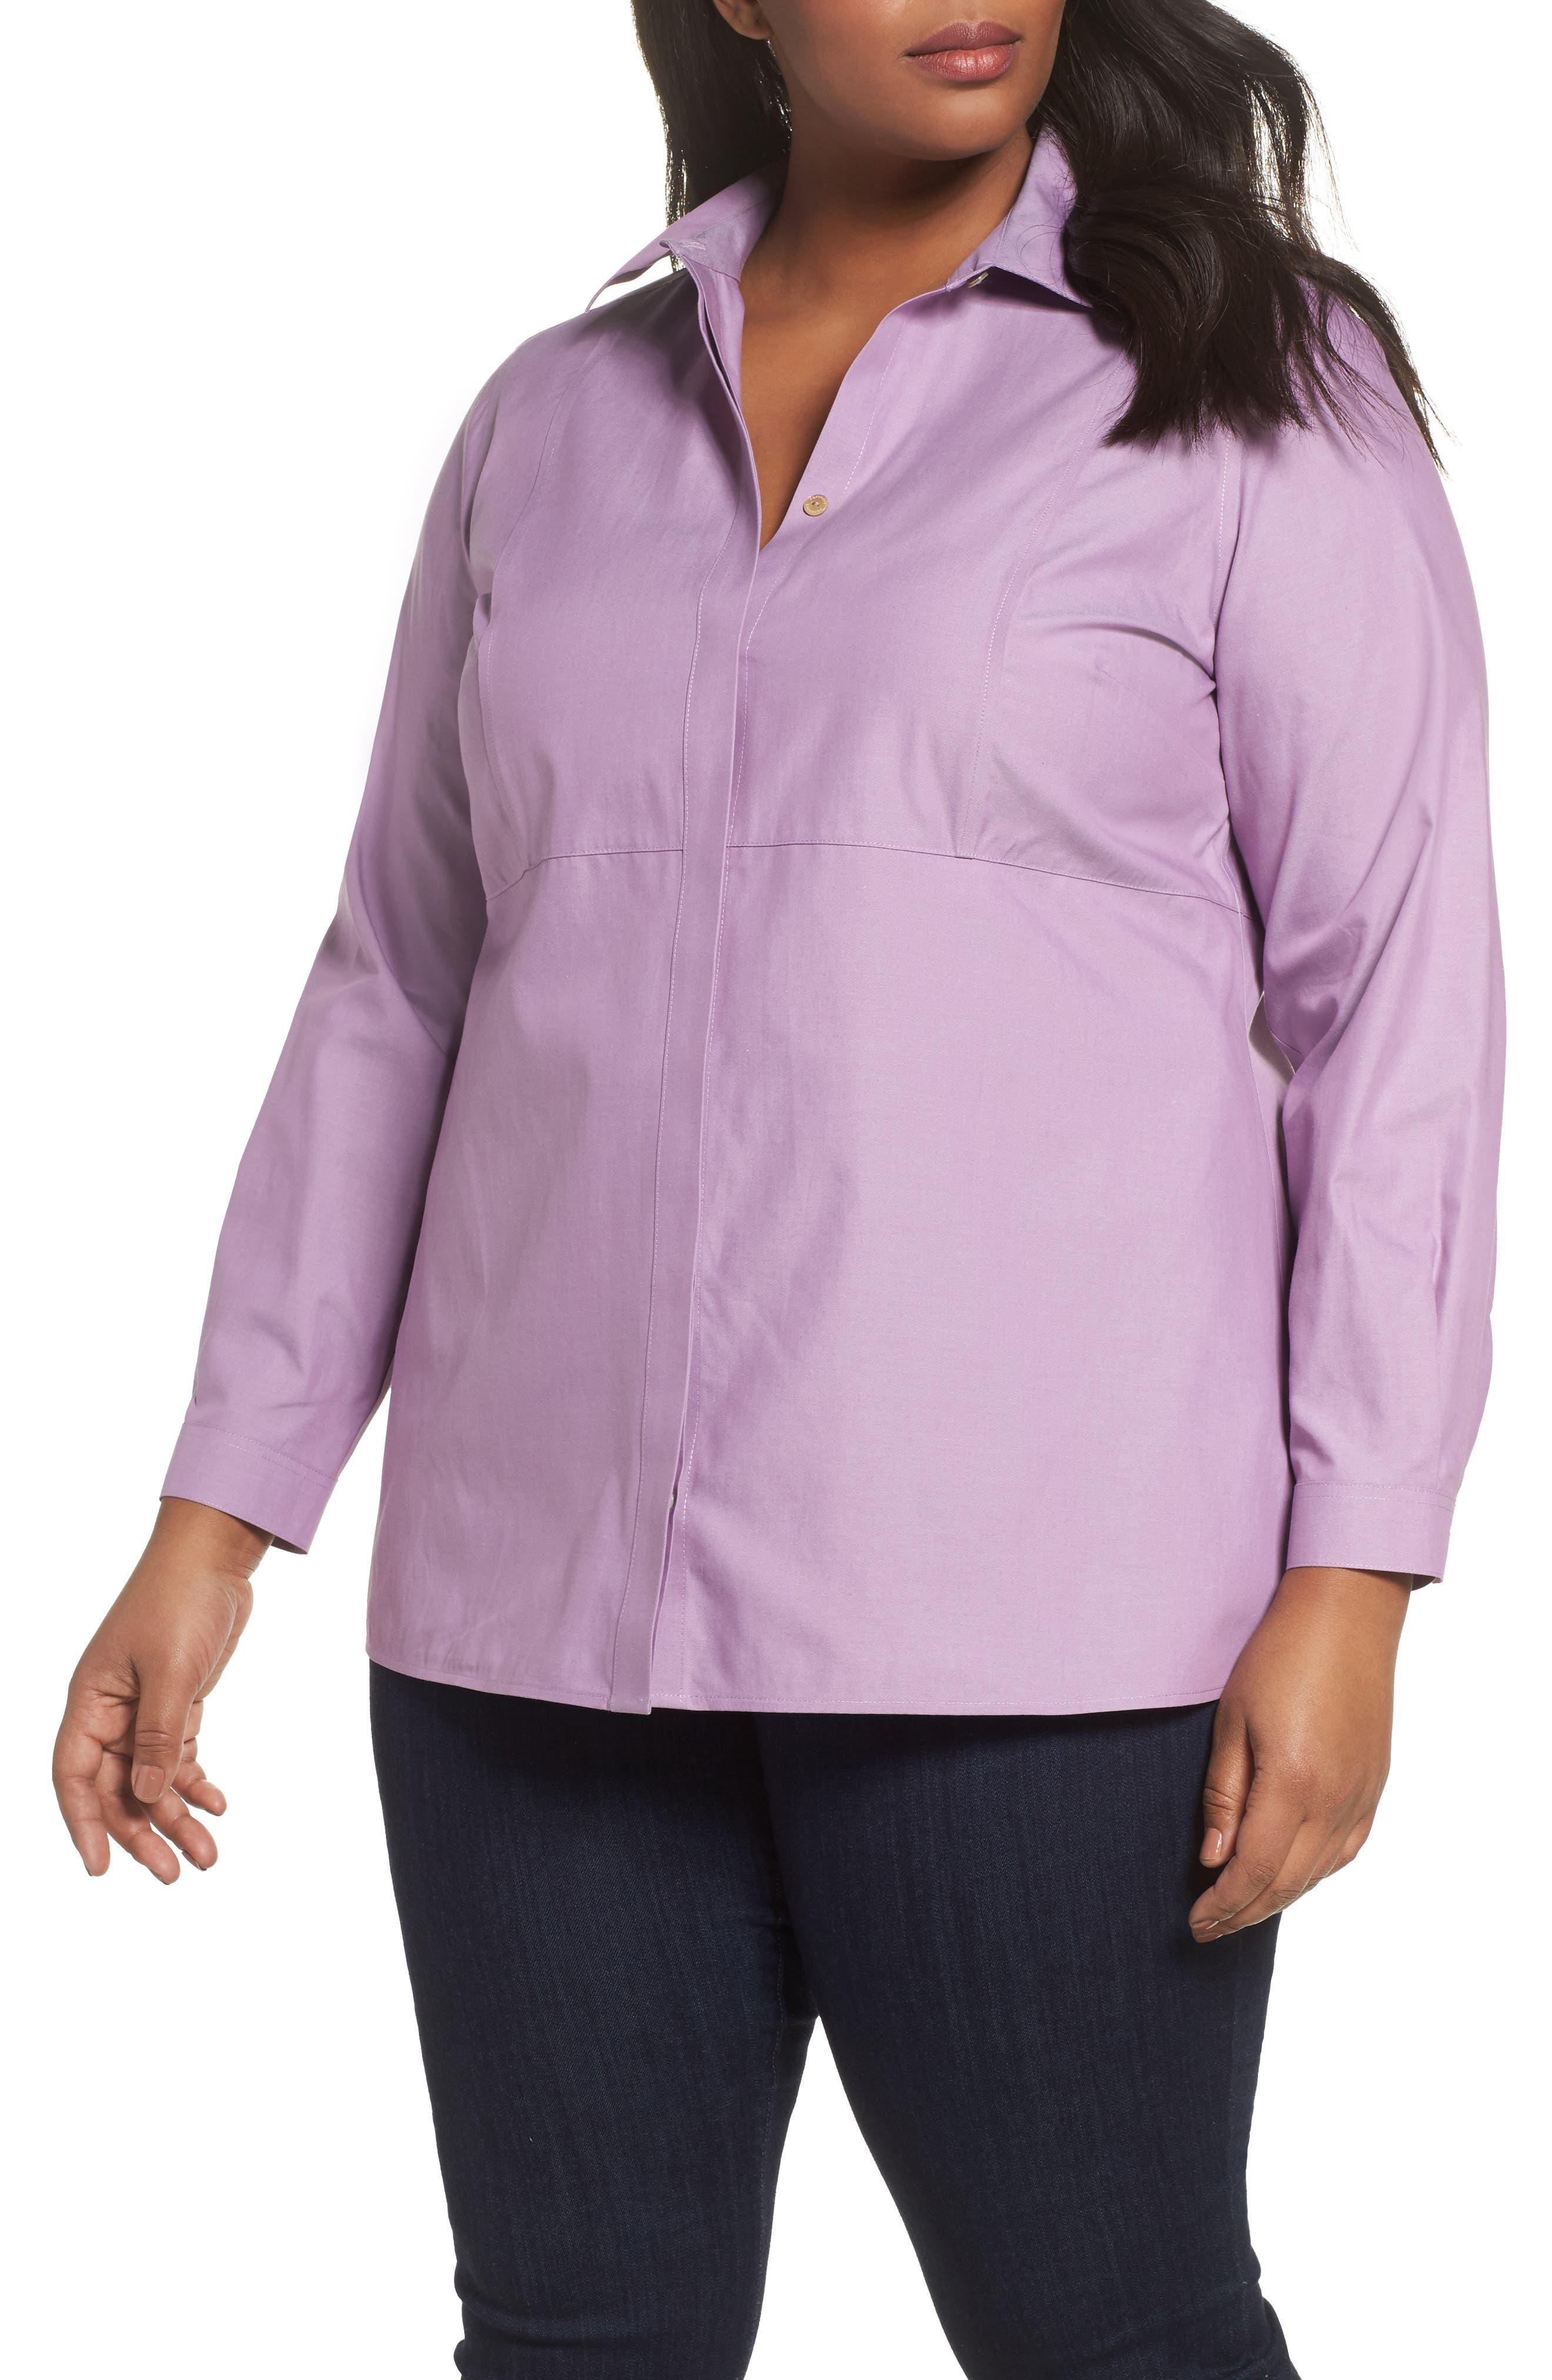 Pinpoint Oxford Cloth Shirt,                         Main,                         color, Mauve